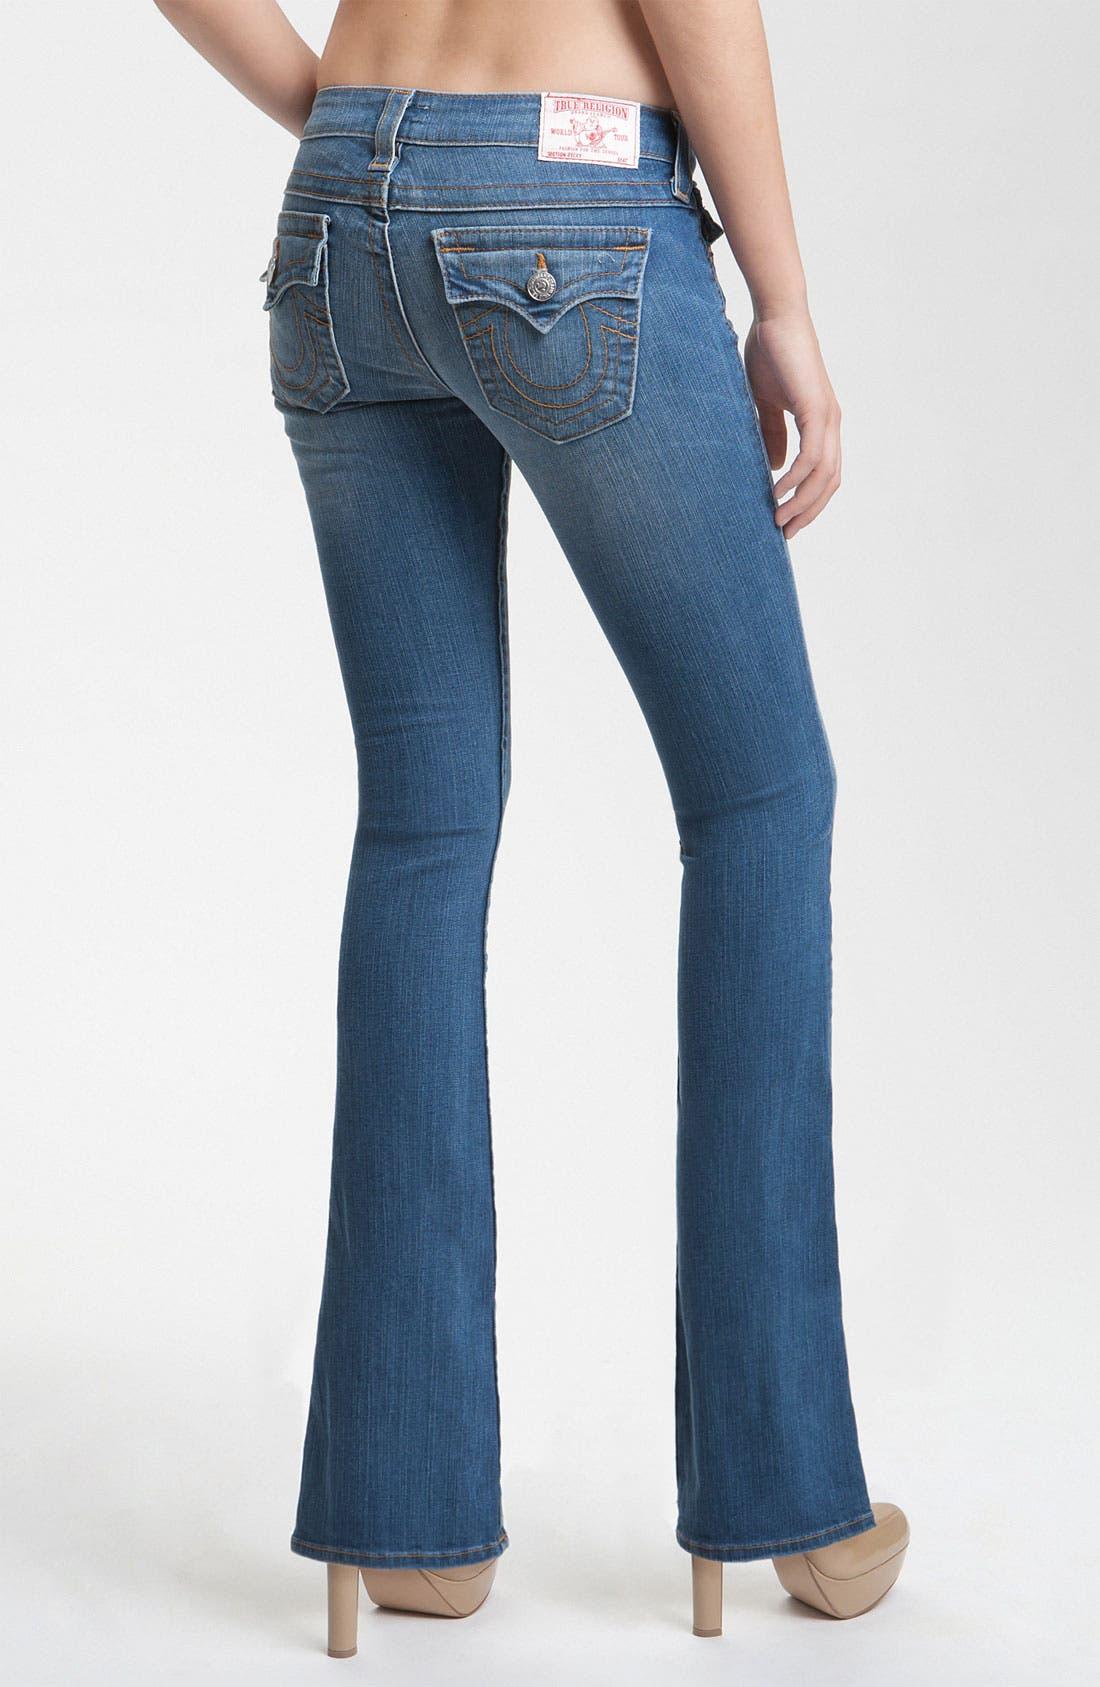 Alternate Image 2  - True Religion Brand Jeans 'Becky' Bootcut Jeans (Short Fuse)(Petite)